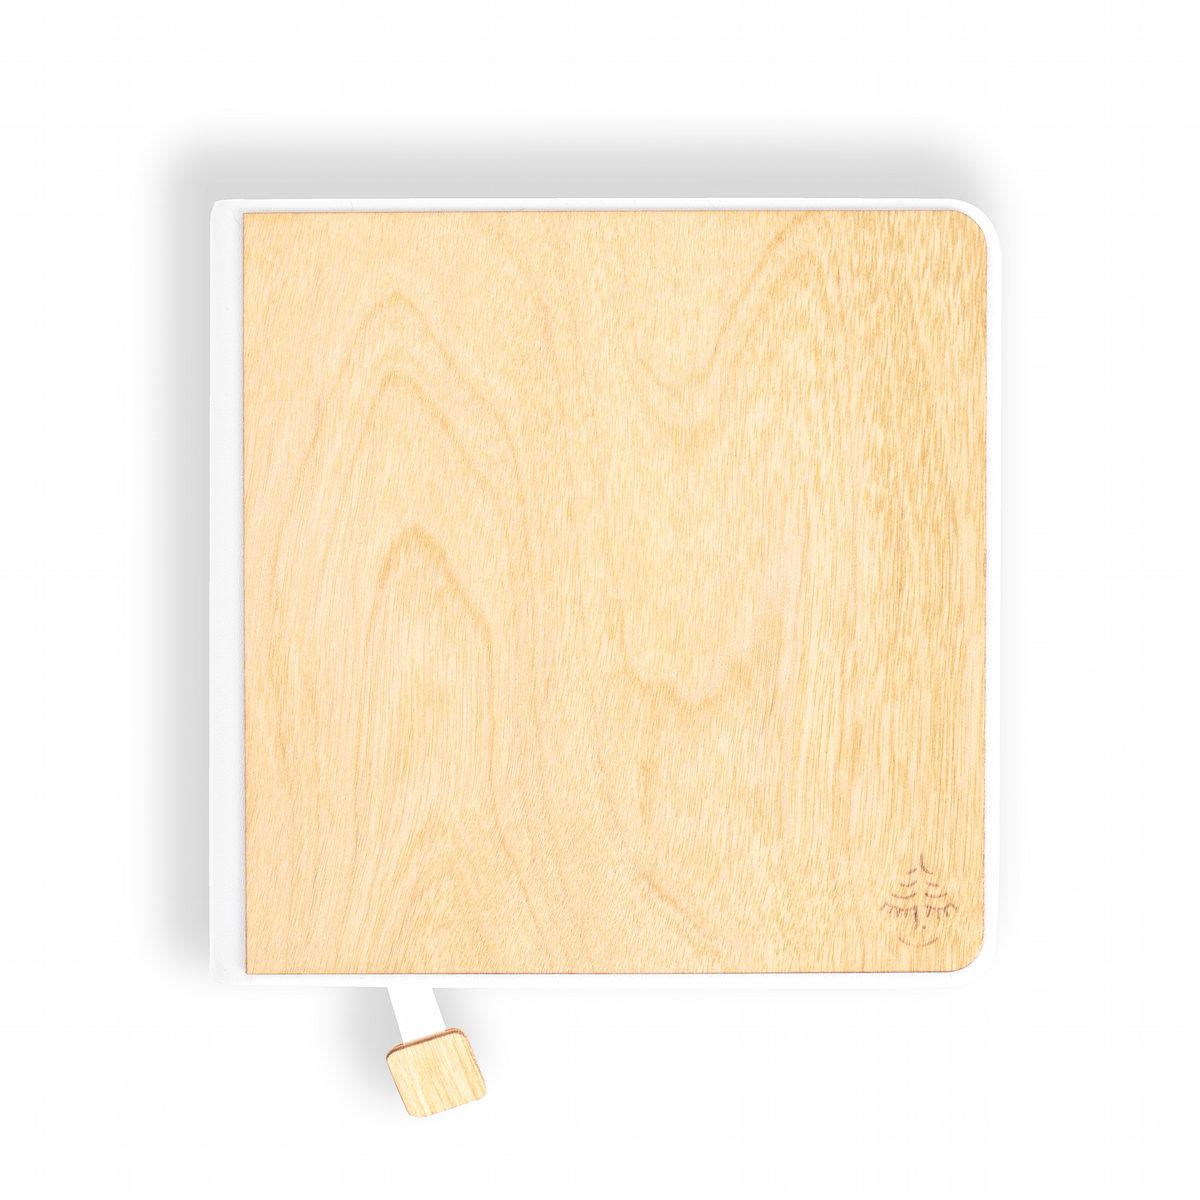 notebook, sketchbook yellow, wooden notebook